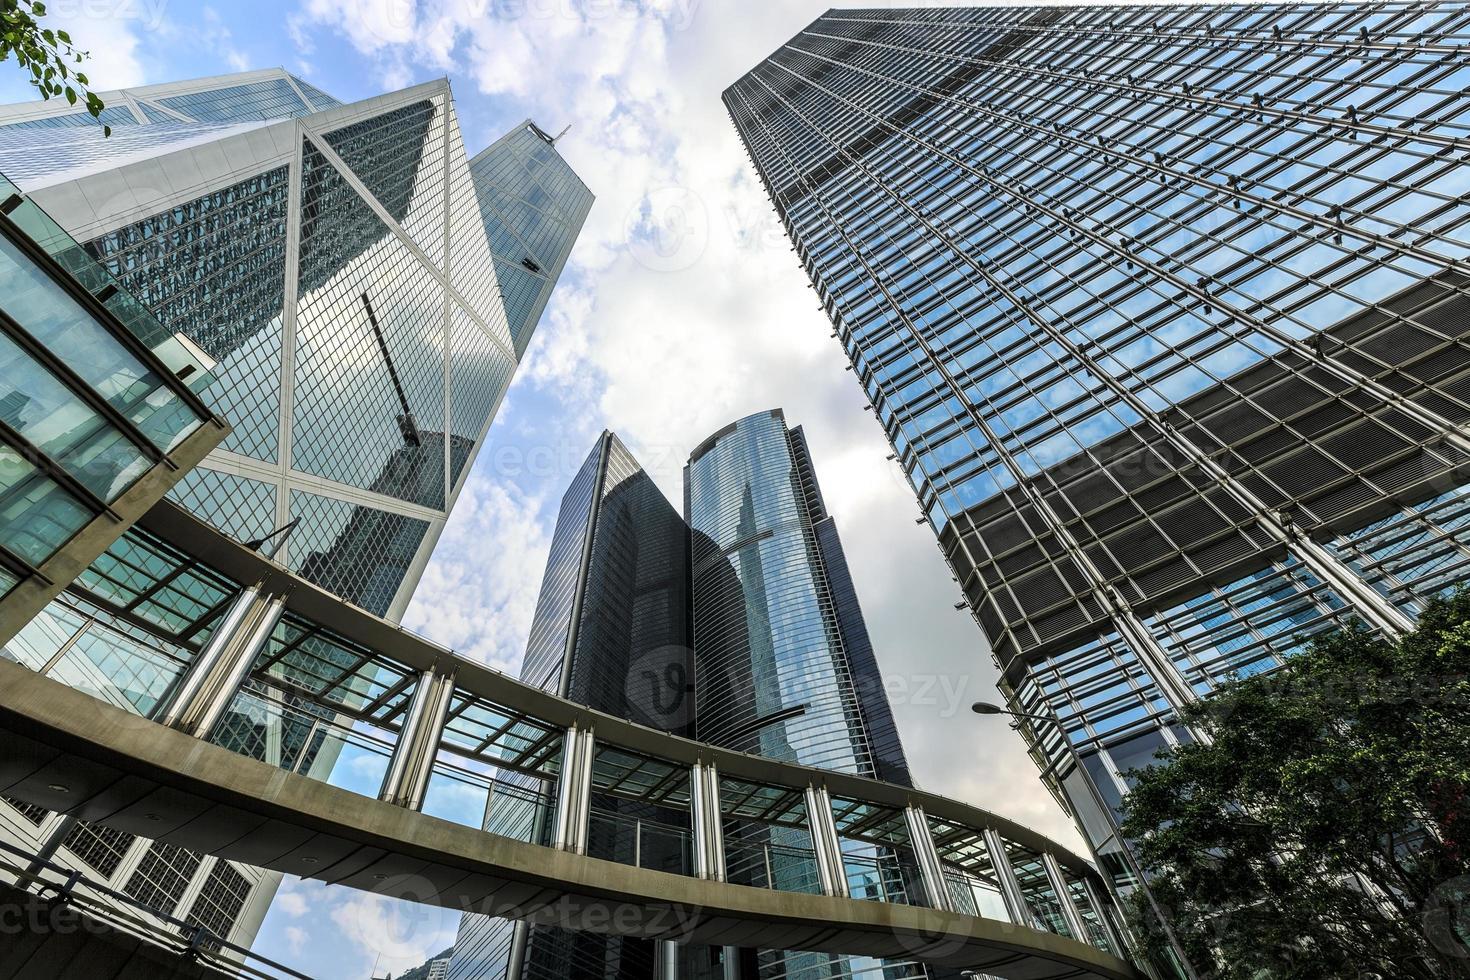 Hong Kong Corporate Buildings photo